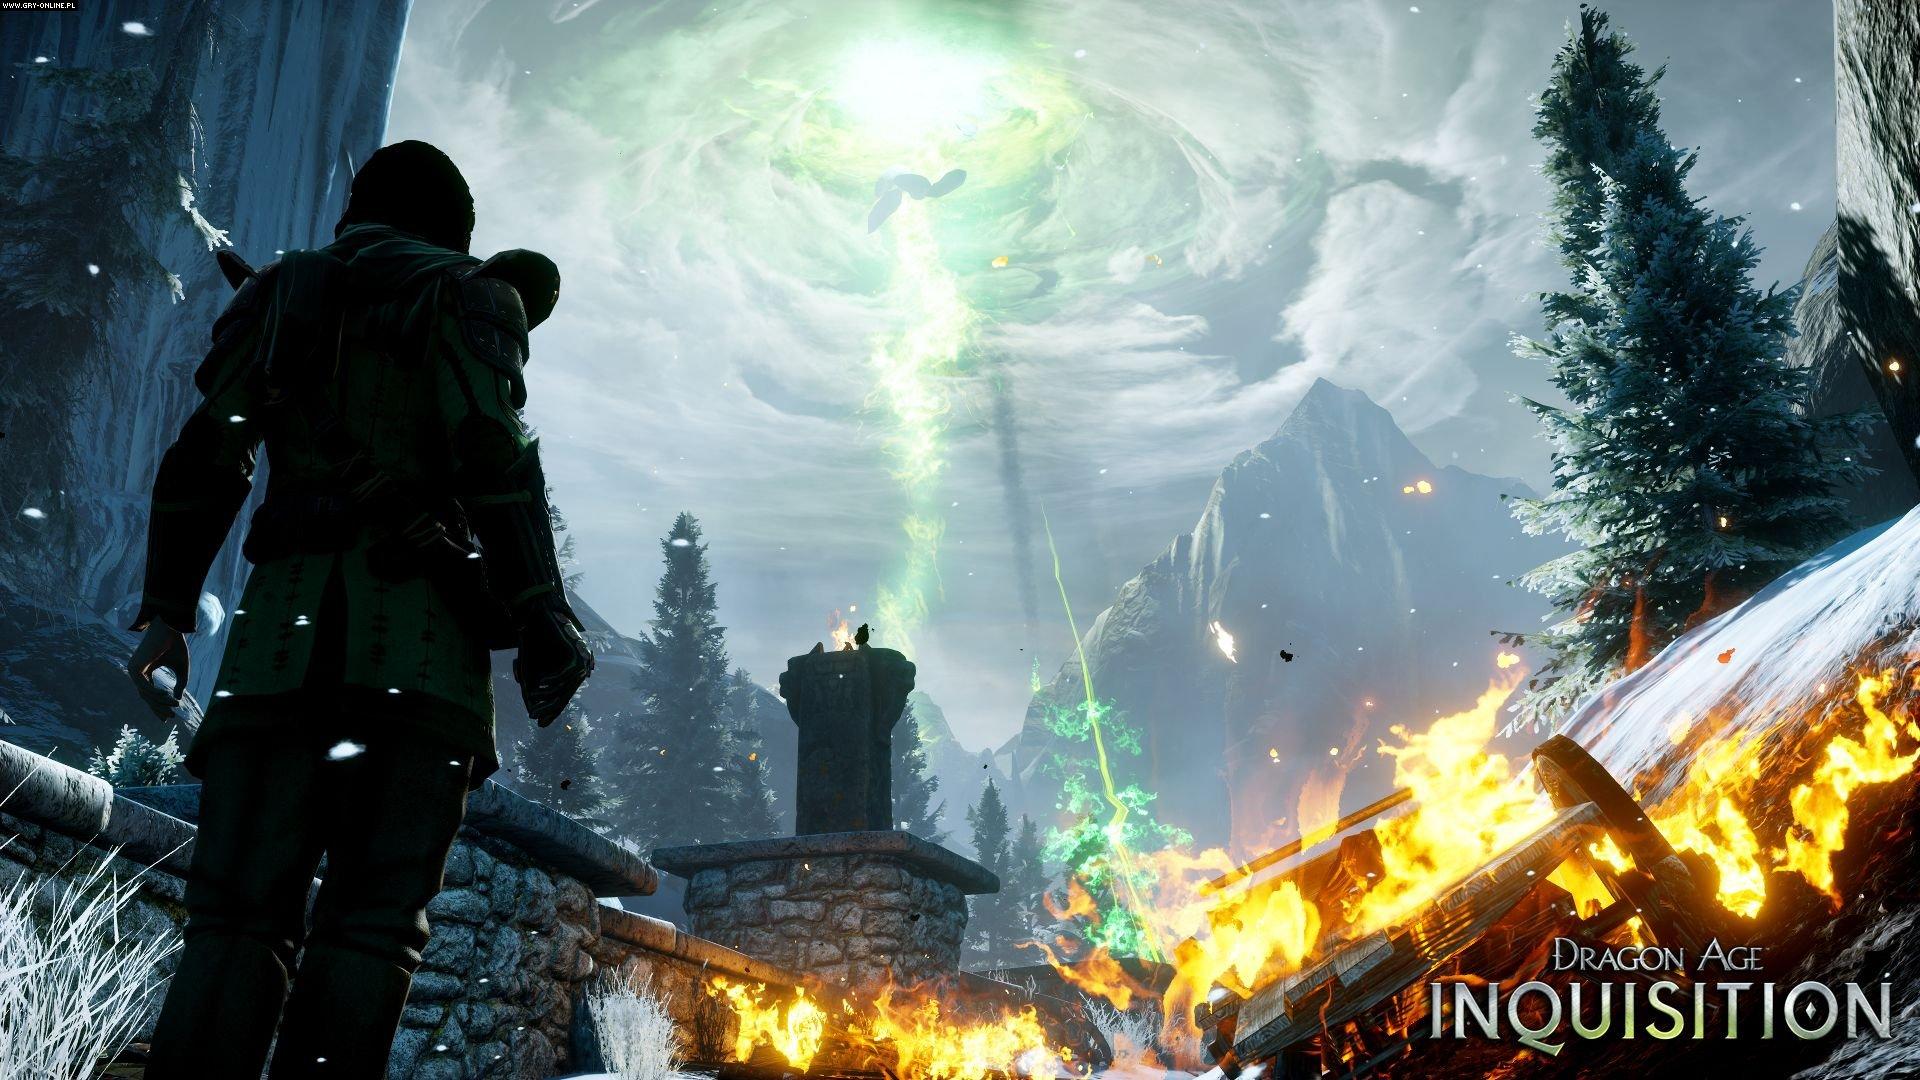 Dragon Age 3 Inquisition  № 1901443 загрузить